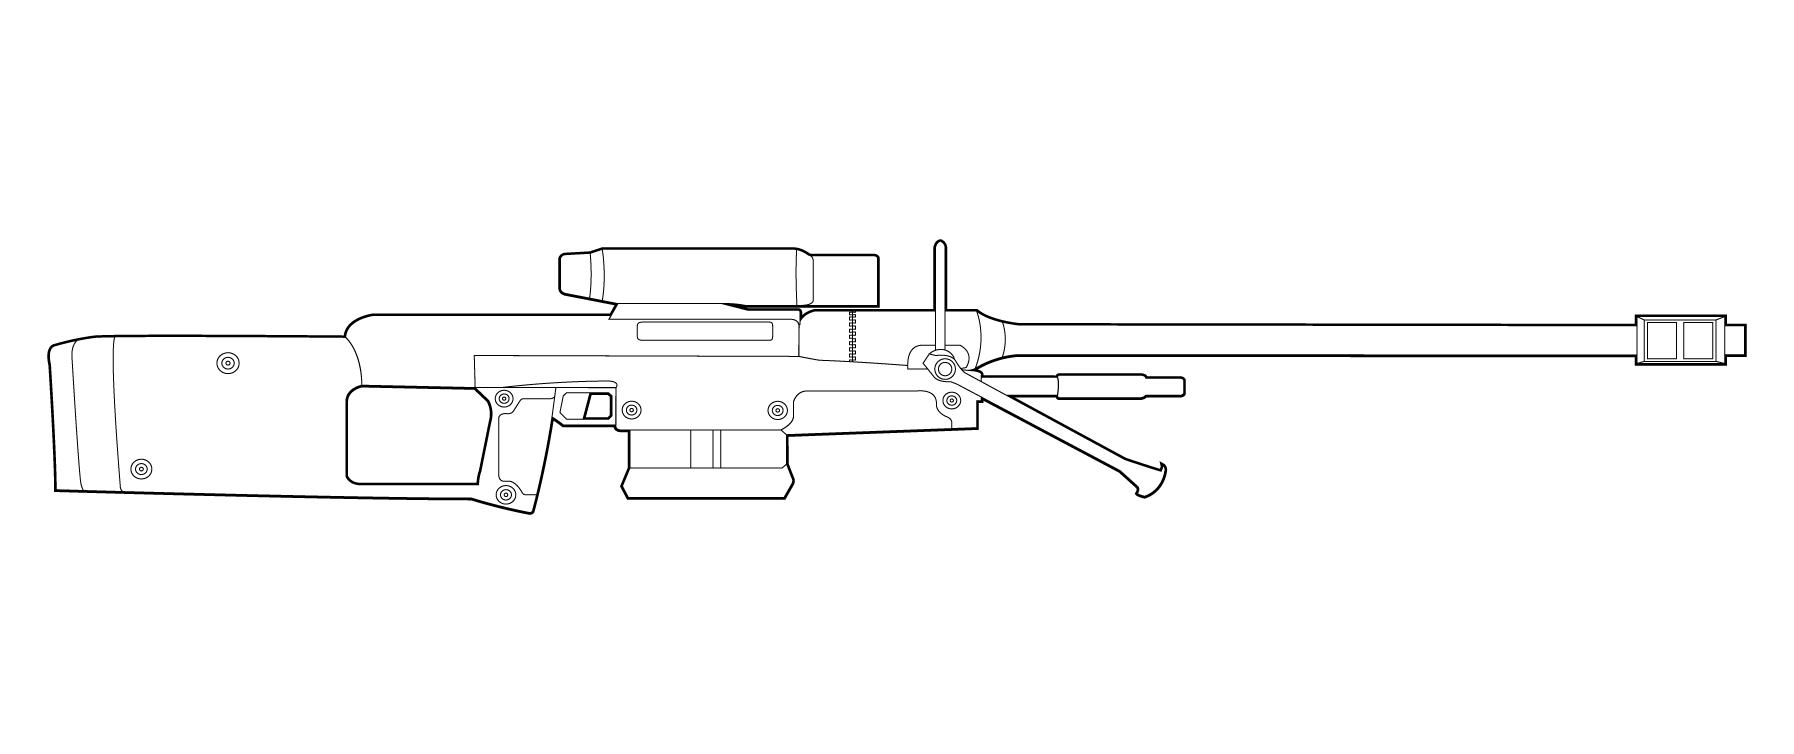 One Line Art Gun : Halo sniper rifle drawing pixshark images